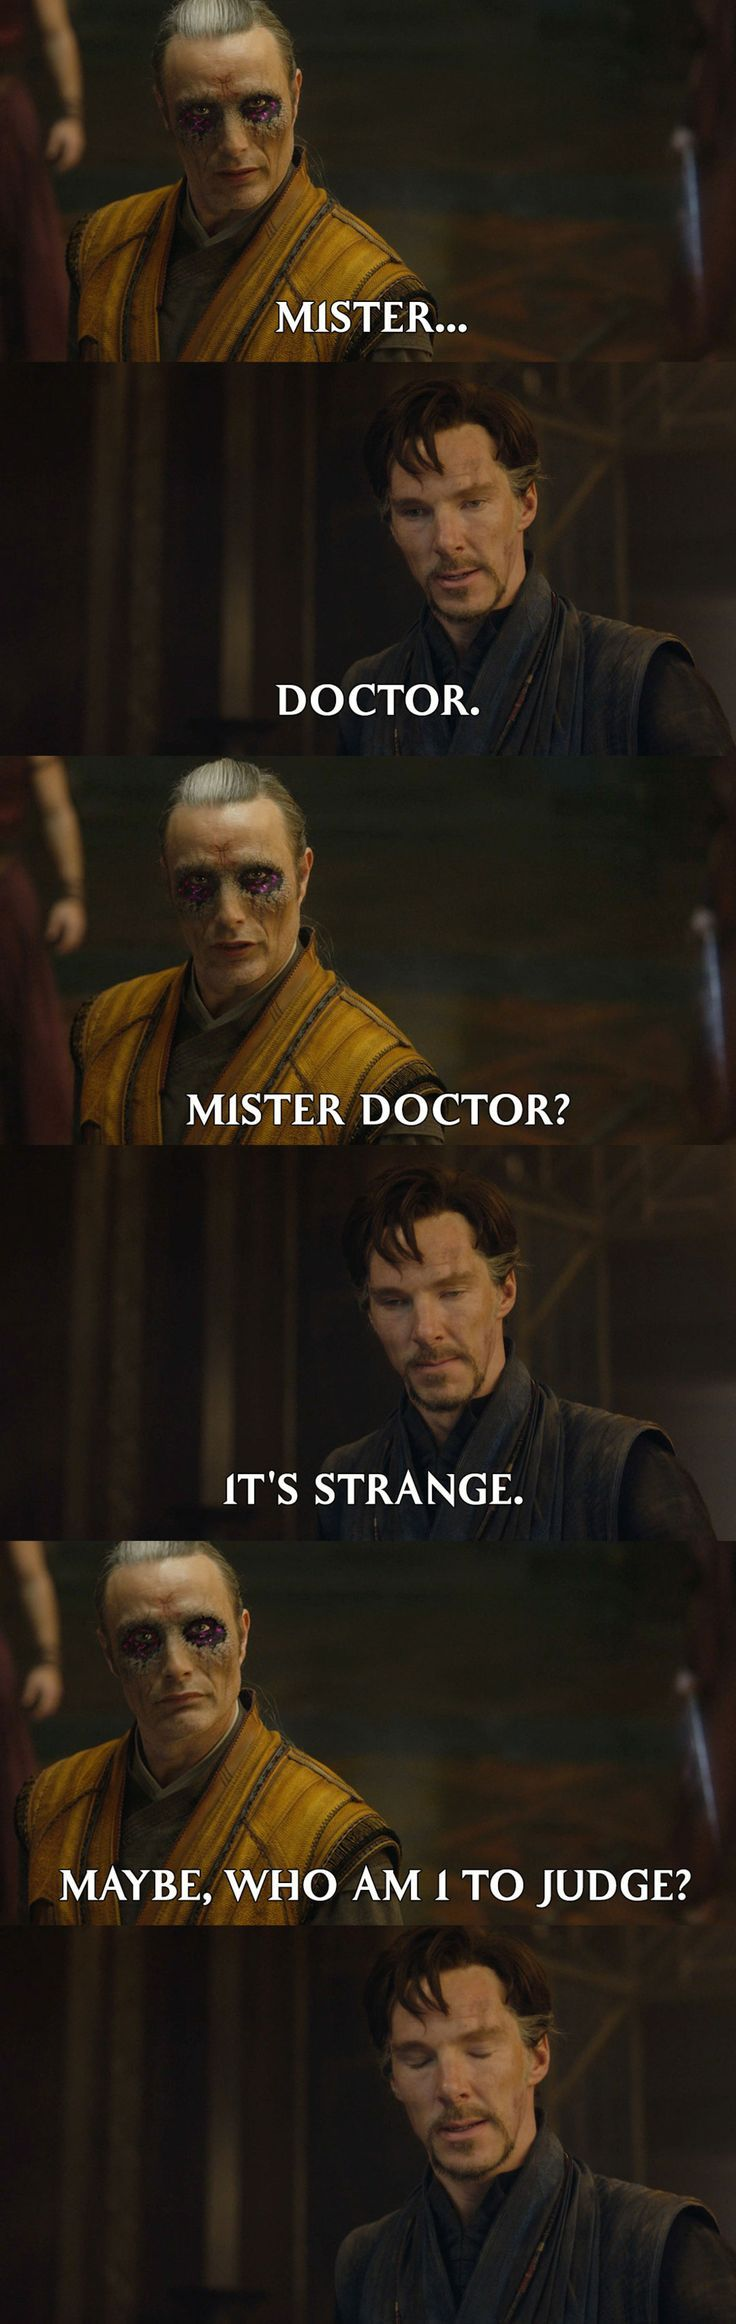 Let's Talk About Doctor Strange's Terrific Vaudevillian Joke